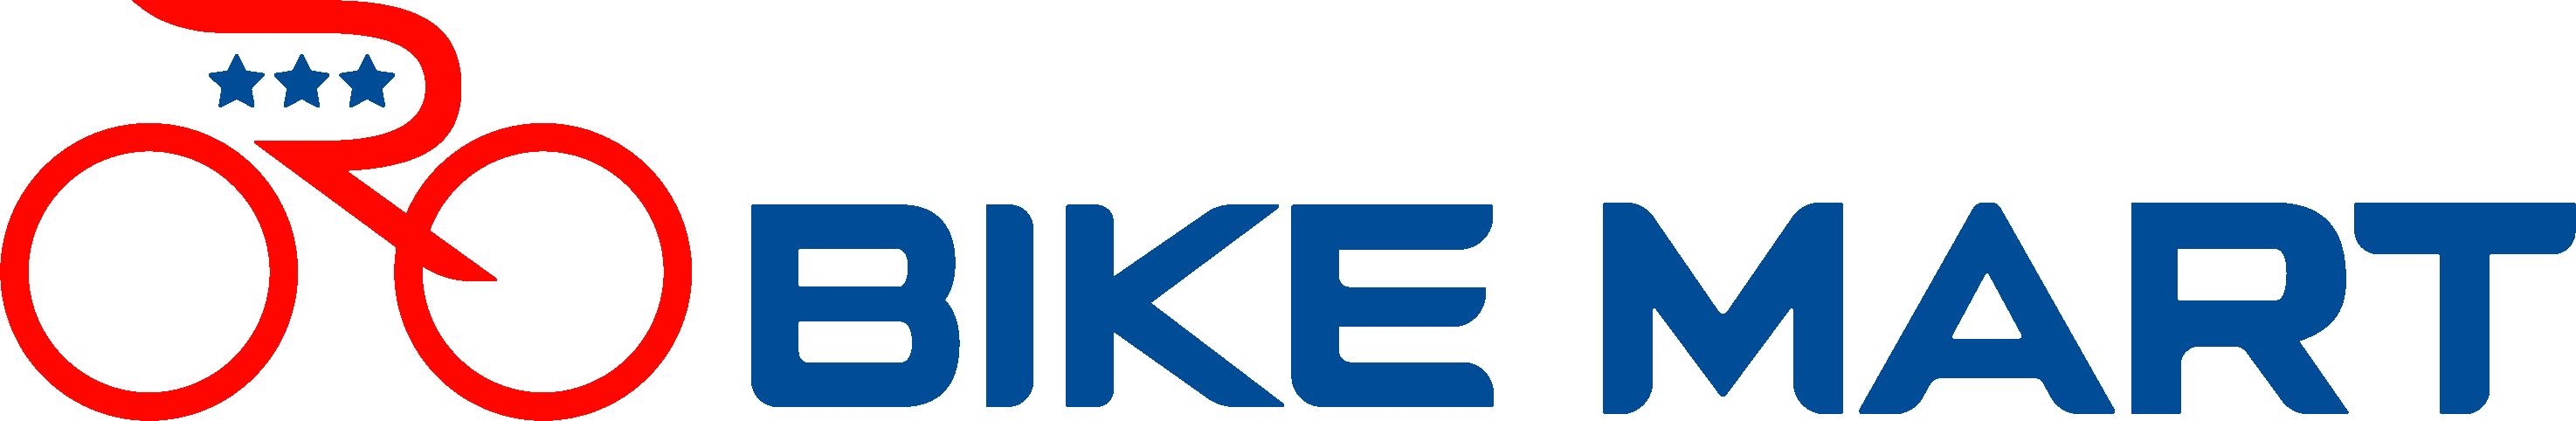 Bike Mart Home Page